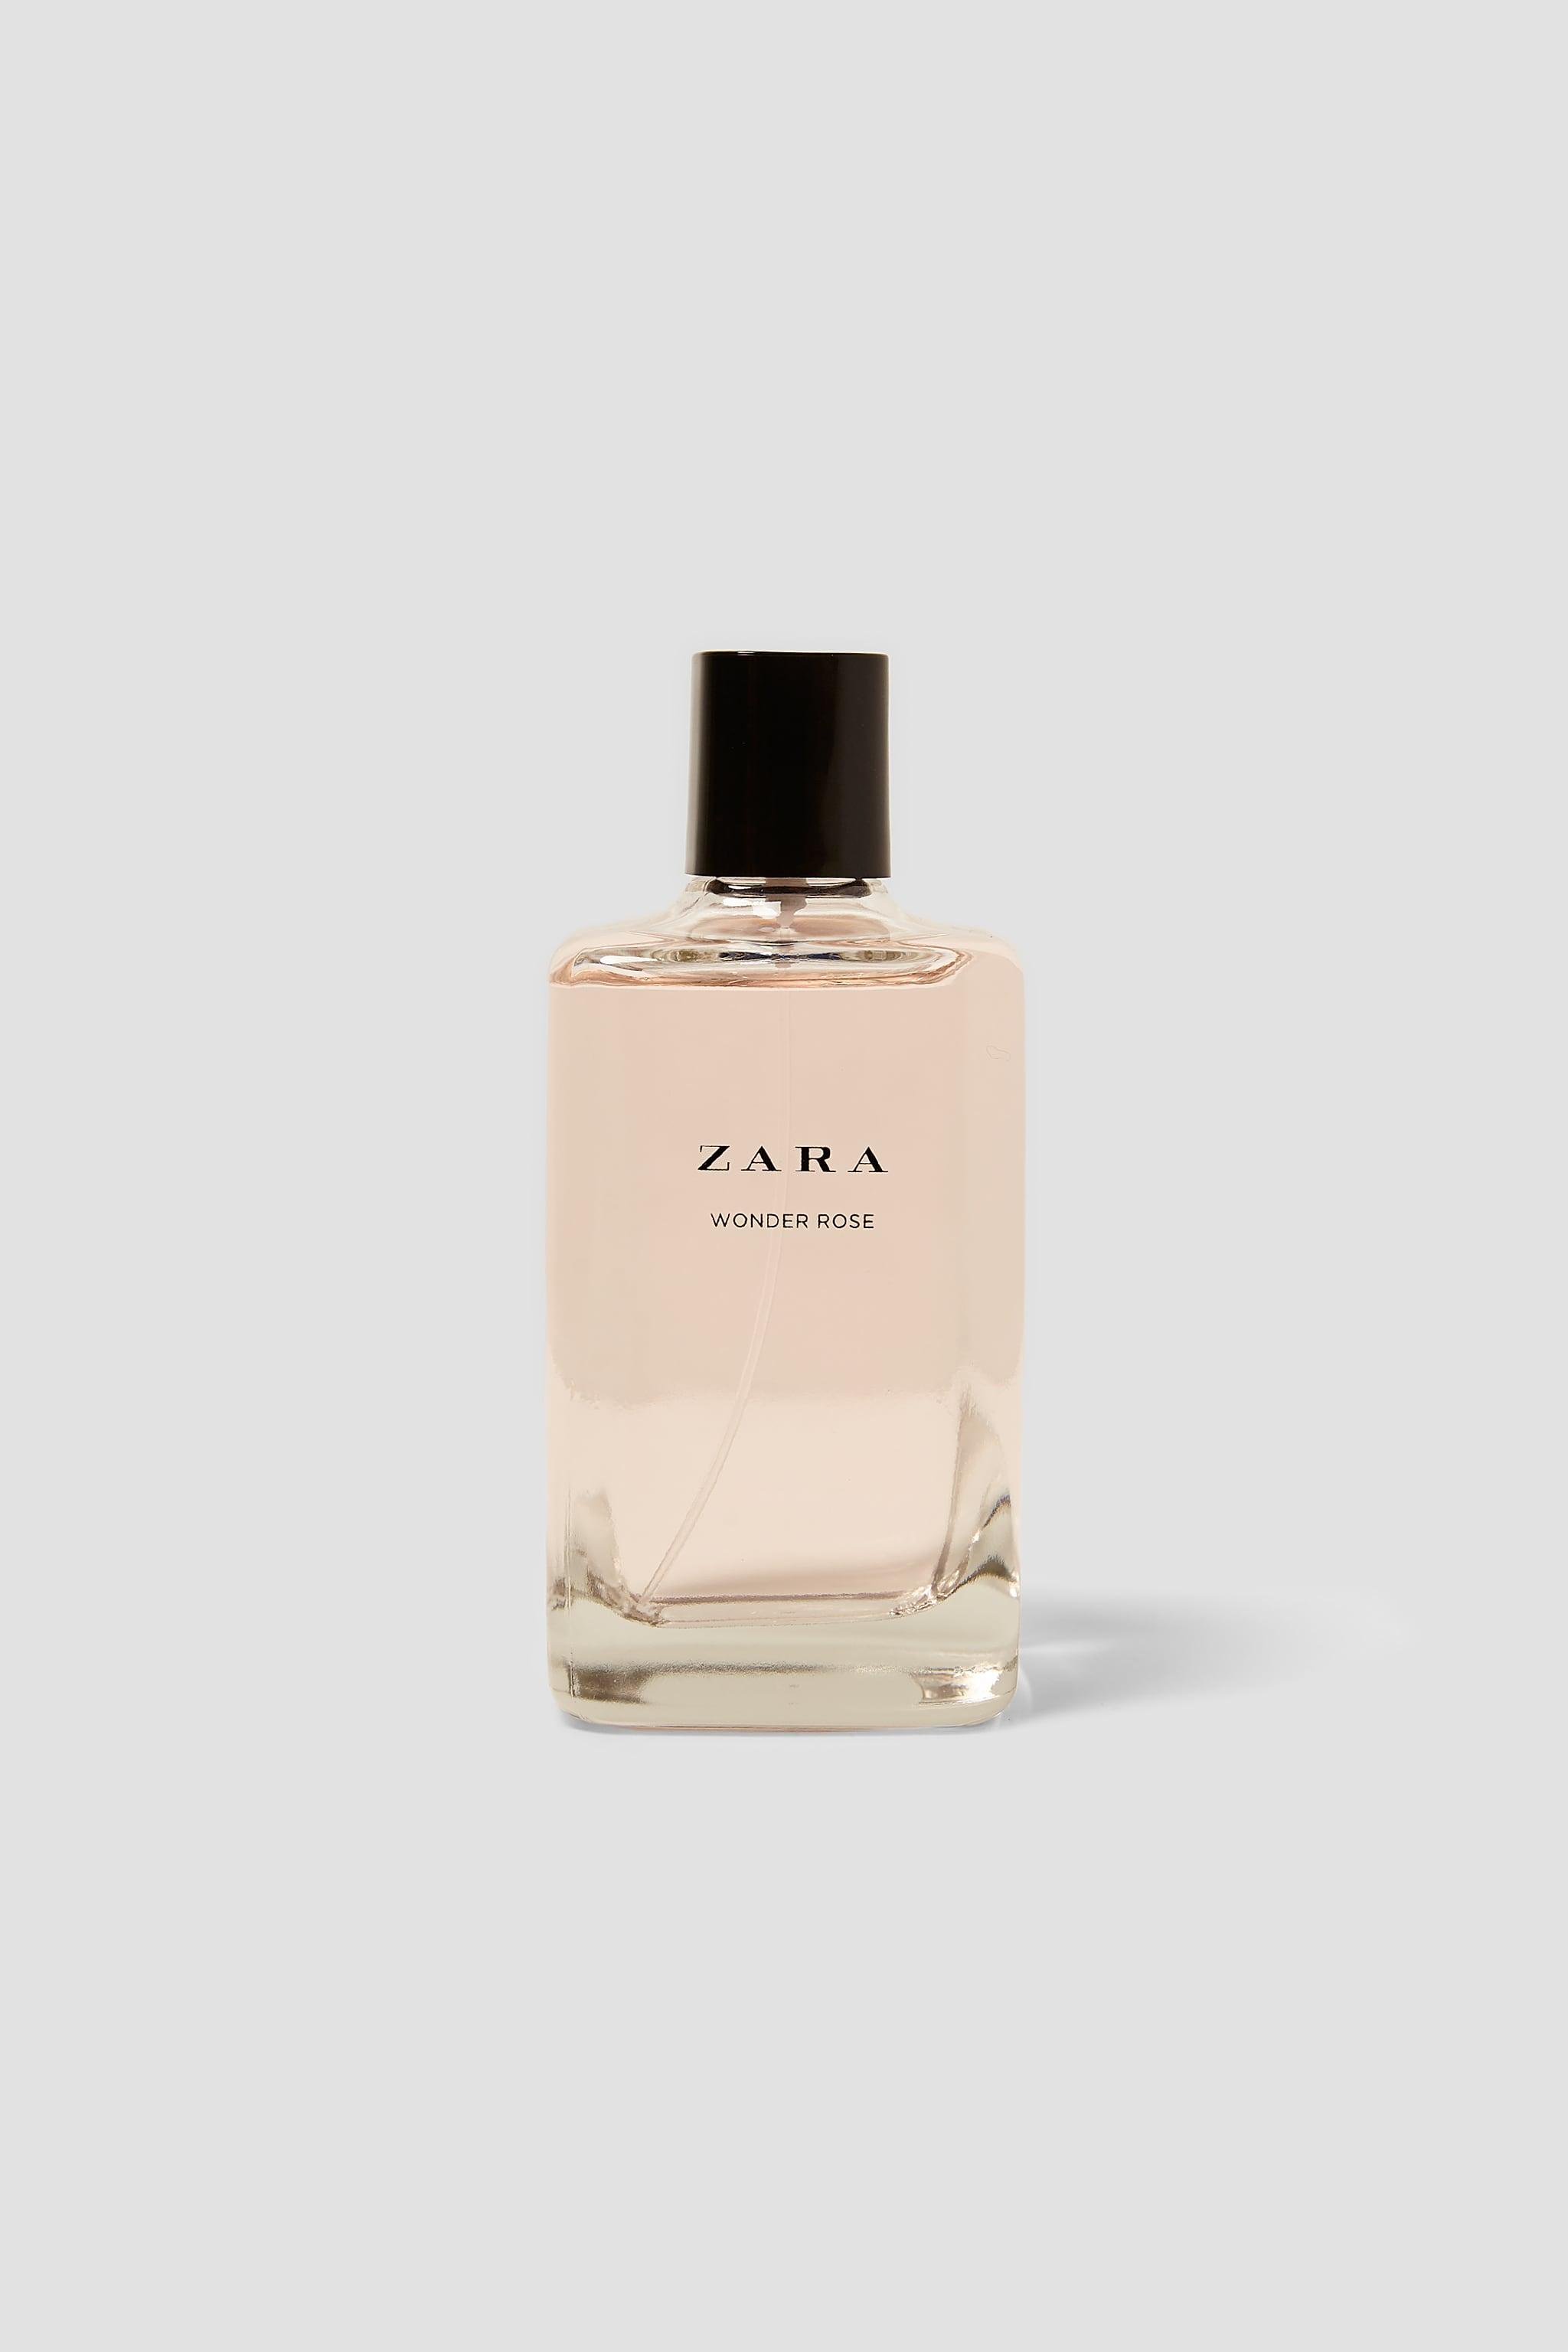 Zara WONDER ROSE 200 ml